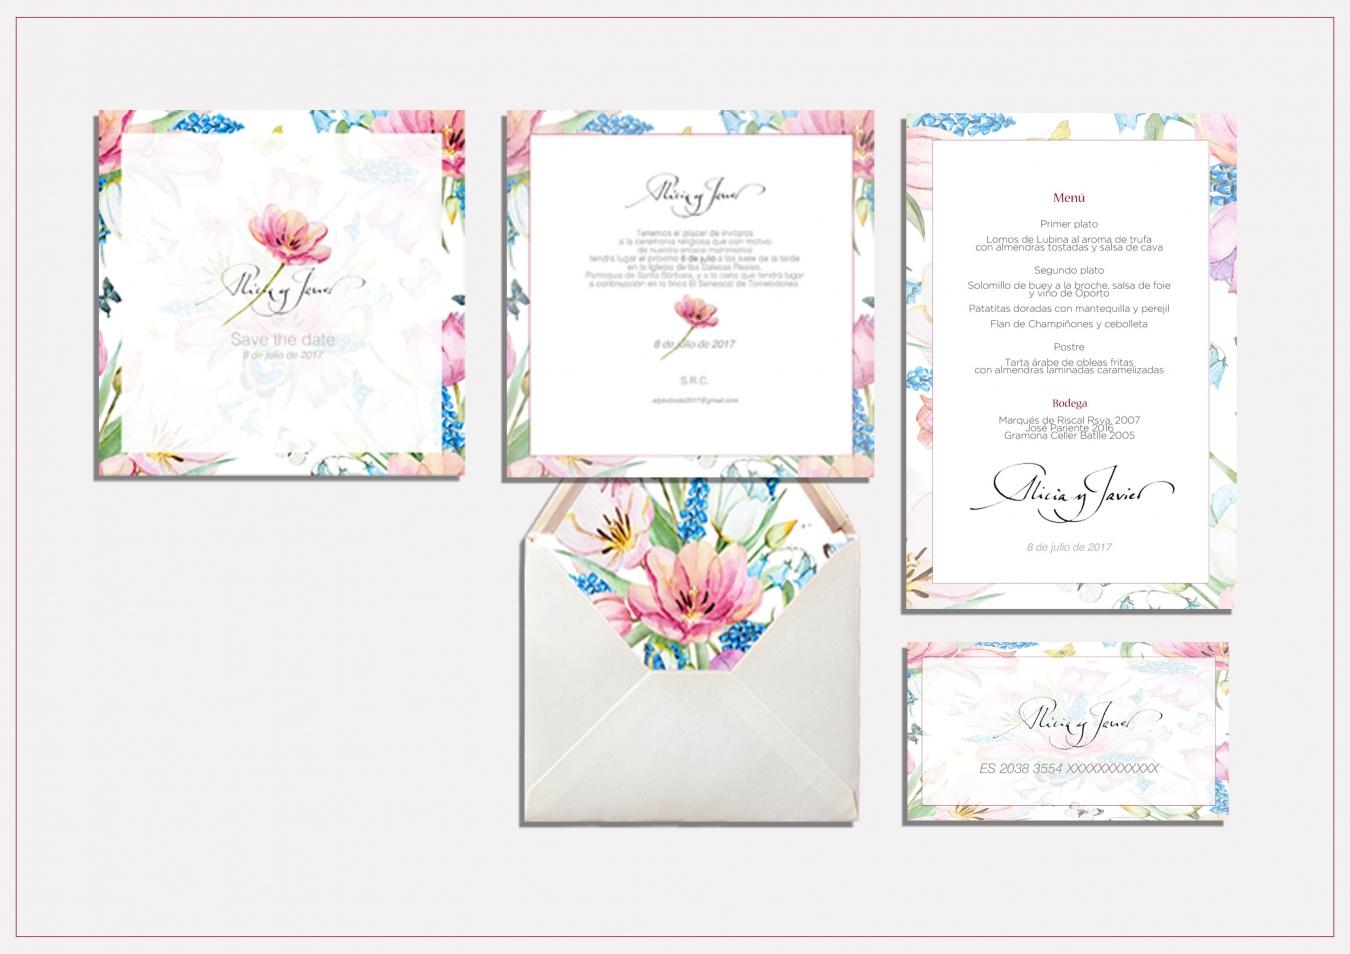 set boda - Alicia y Javier - Goyo Valmorisco, Calígrafo profesional. Profesor de caligrafía. Diseño caligráfico.